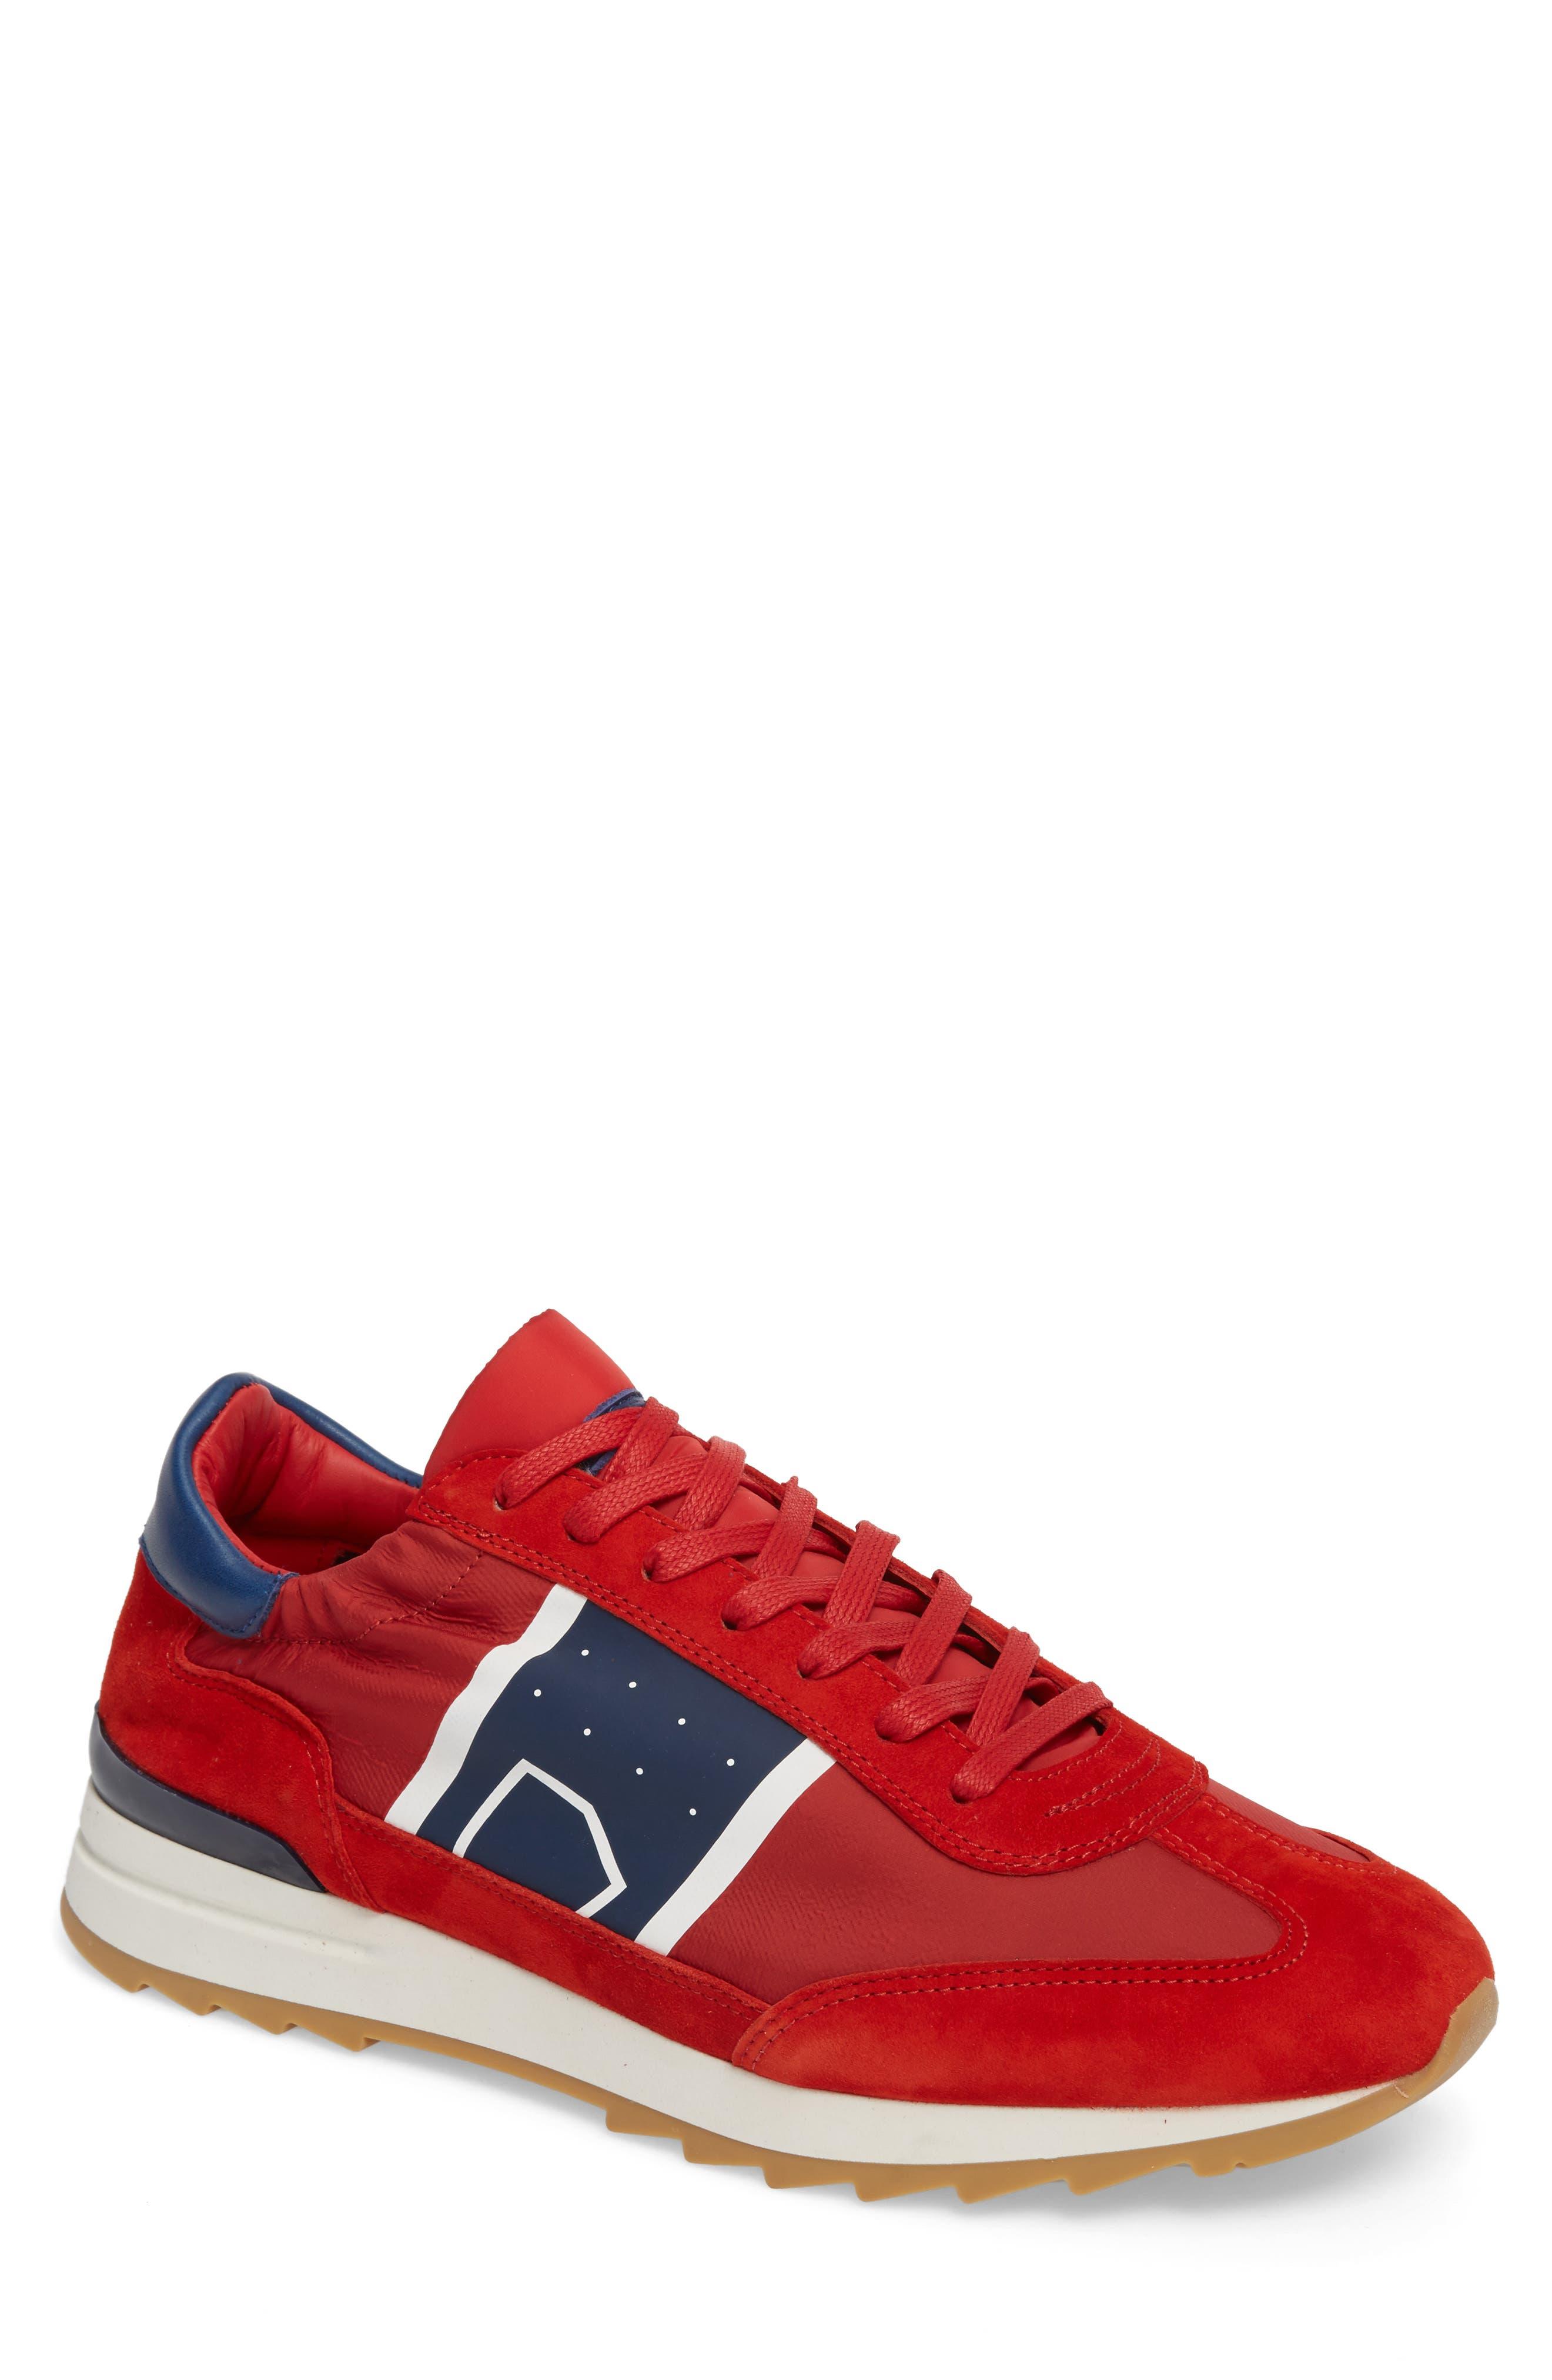 Toujours Sneaker,                             Main thumbnail 1, color,                             600